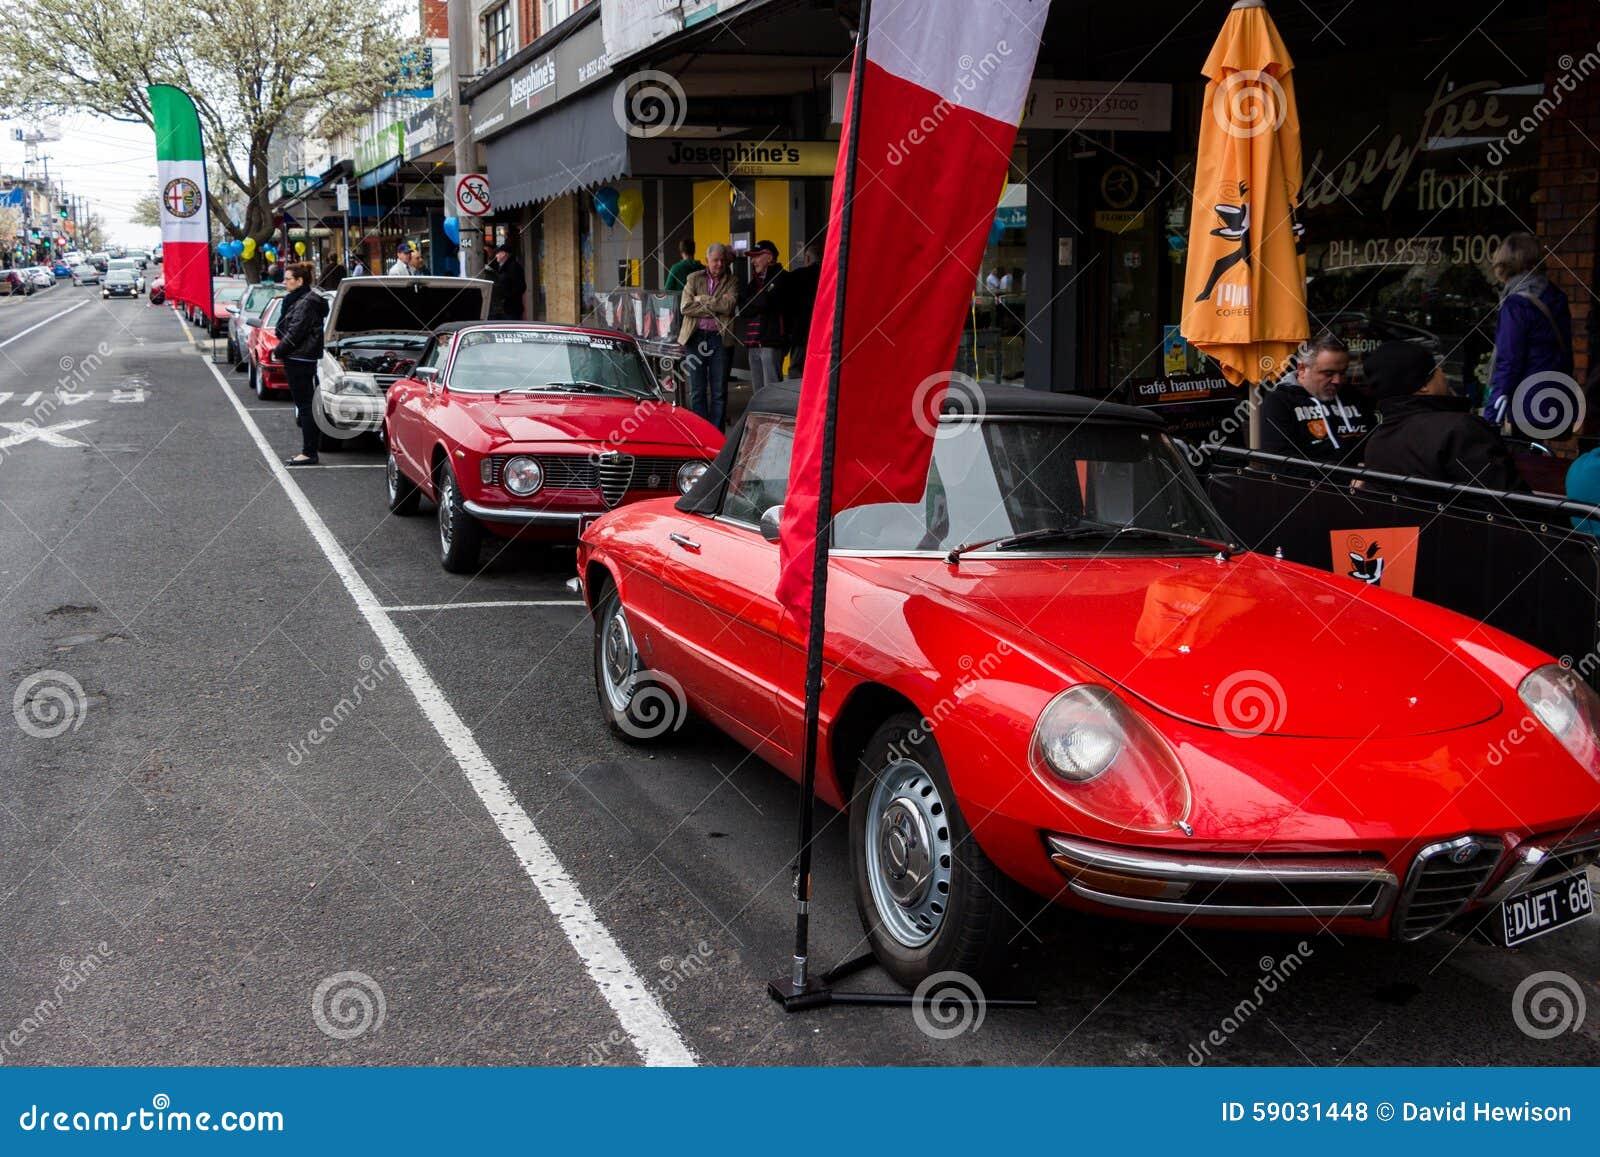 Italian Classic Sports Cars In A Car Show Editorial Stock Photo